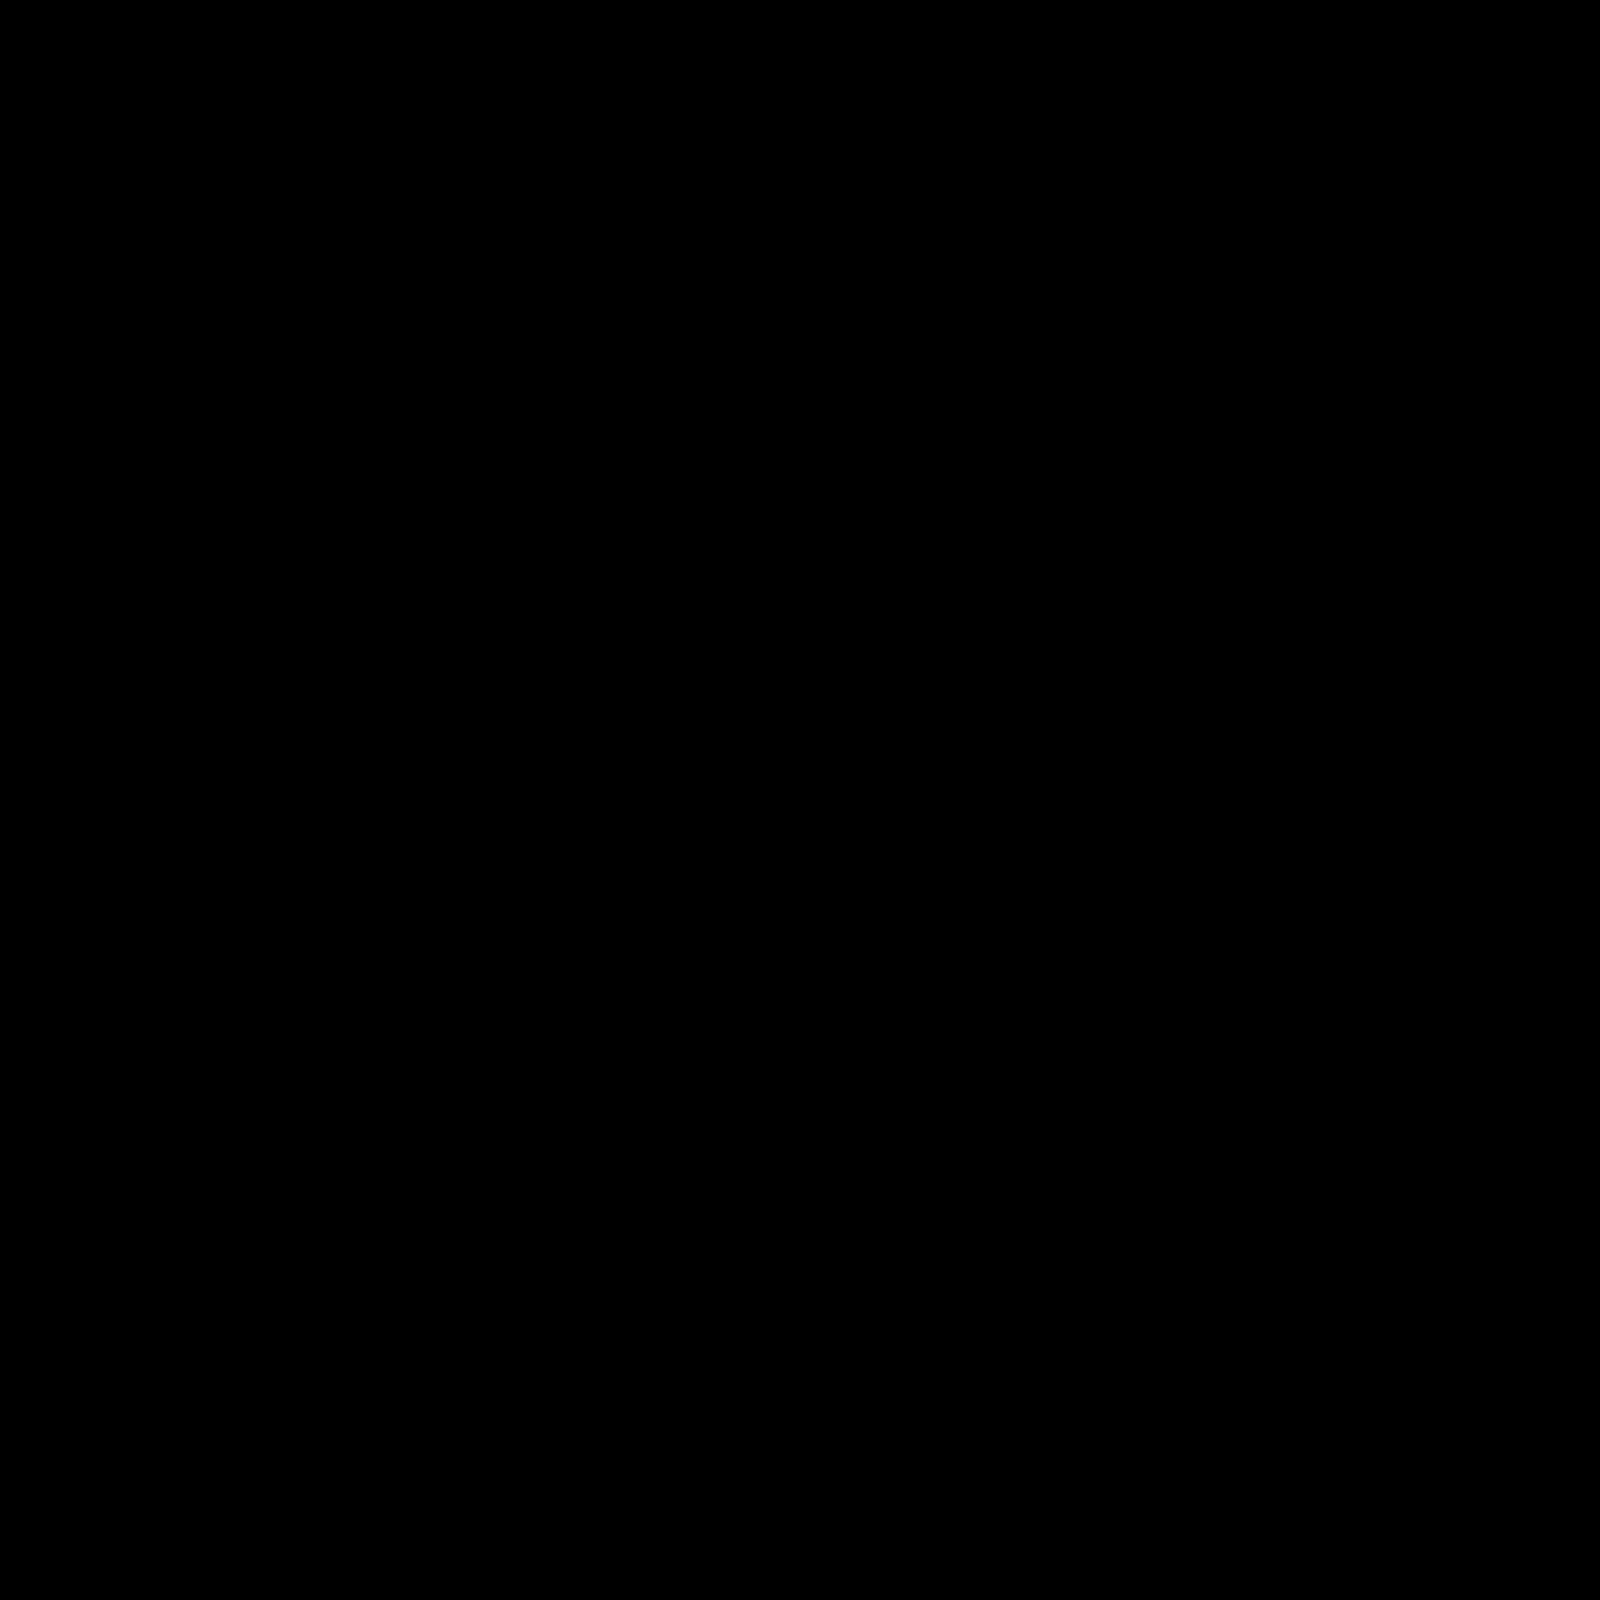 Клещ PNG